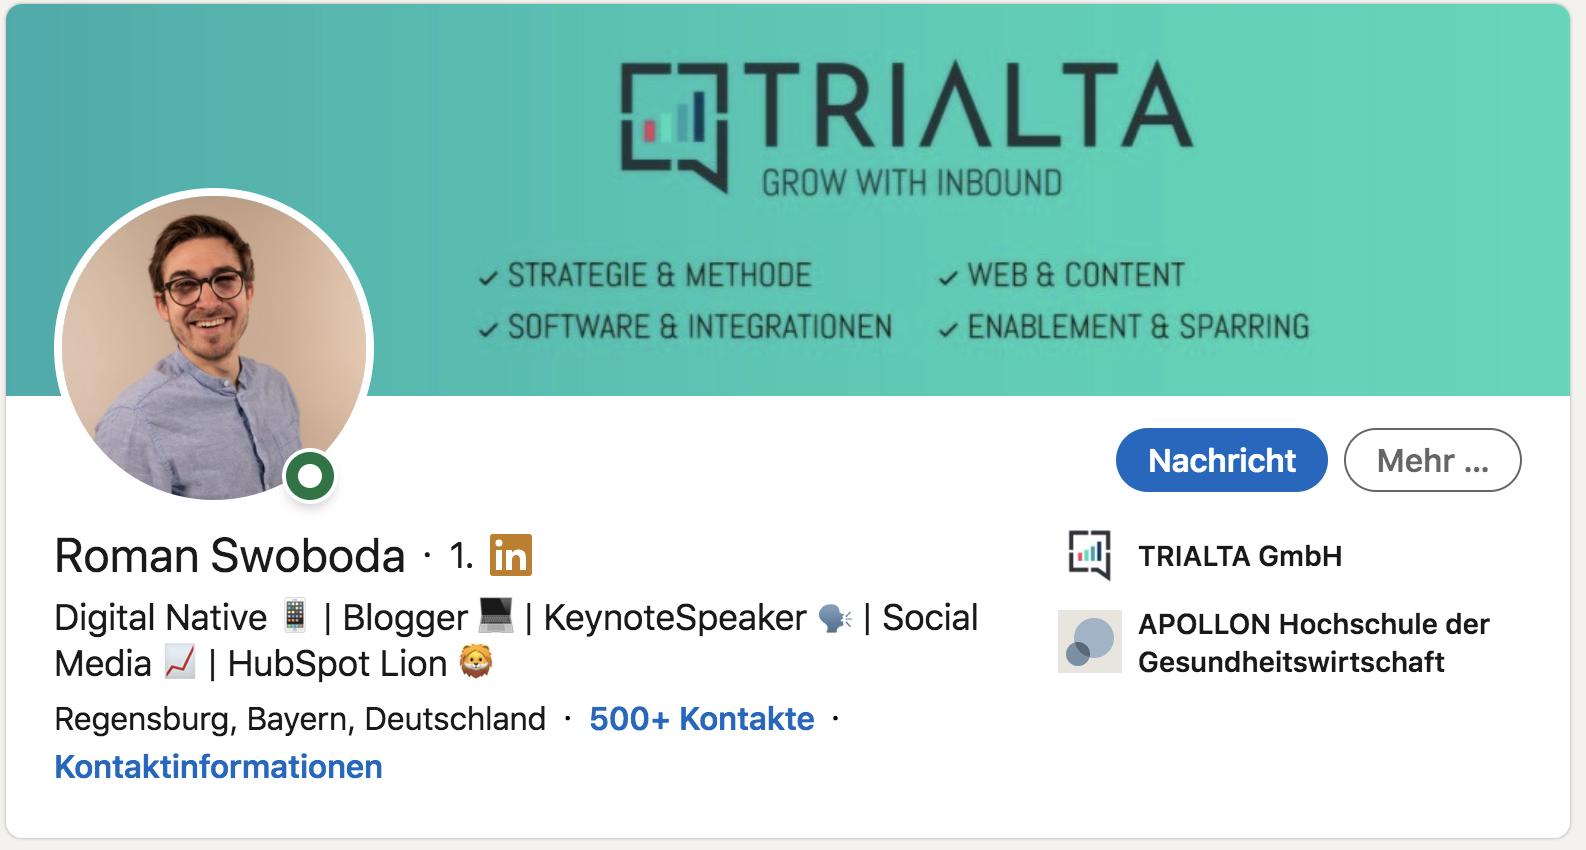 Aktuelles Profil um Social Selling Index in LinkedIn zu steigern